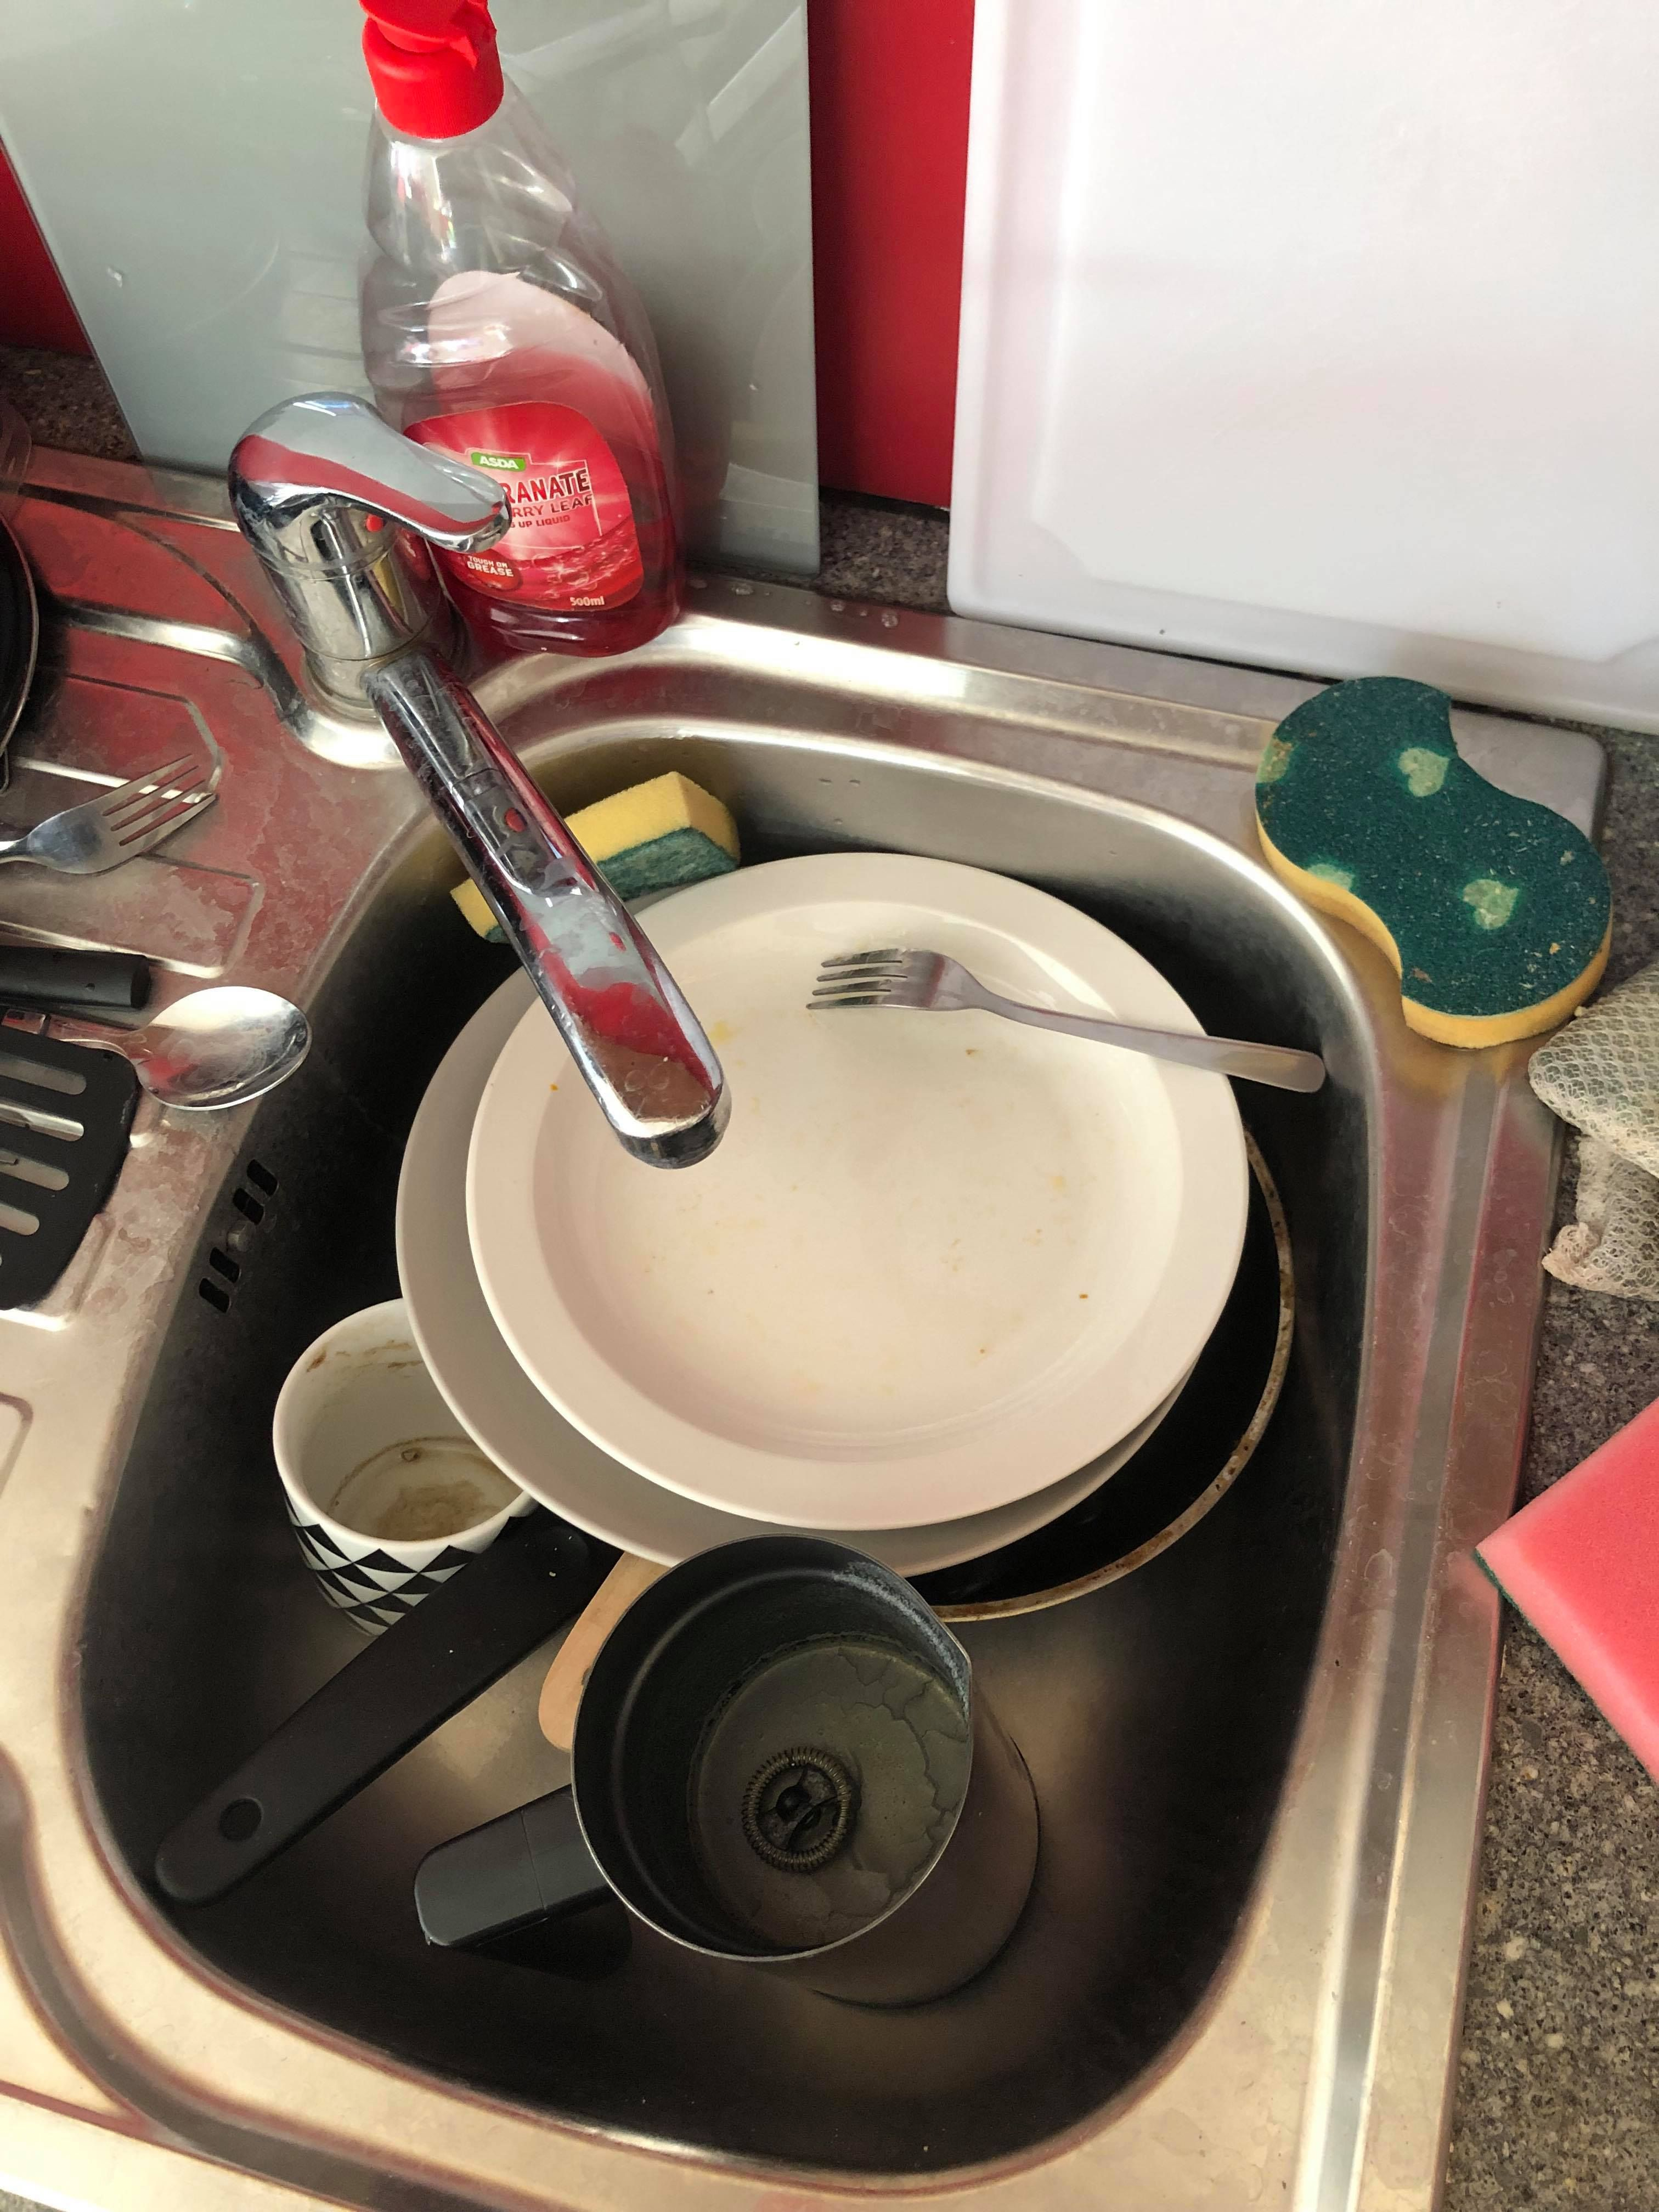 Image may contain: Tire, Wheel, Alloy Wheel, Spoke, Machine, Bowl